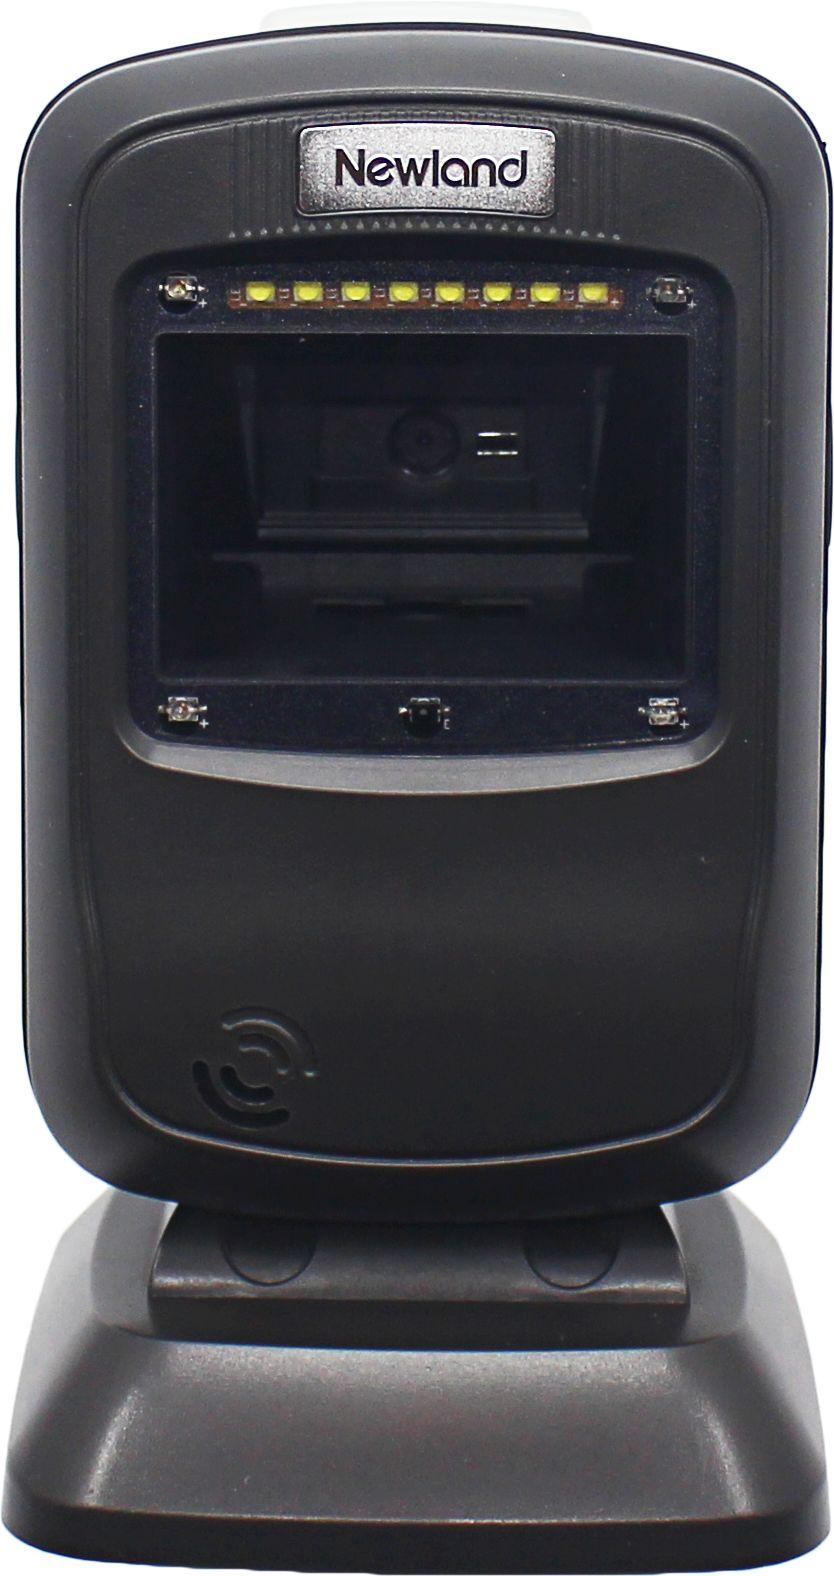 Skaner kodów kreskowych Newland FR4080-20 2D Imager, USB